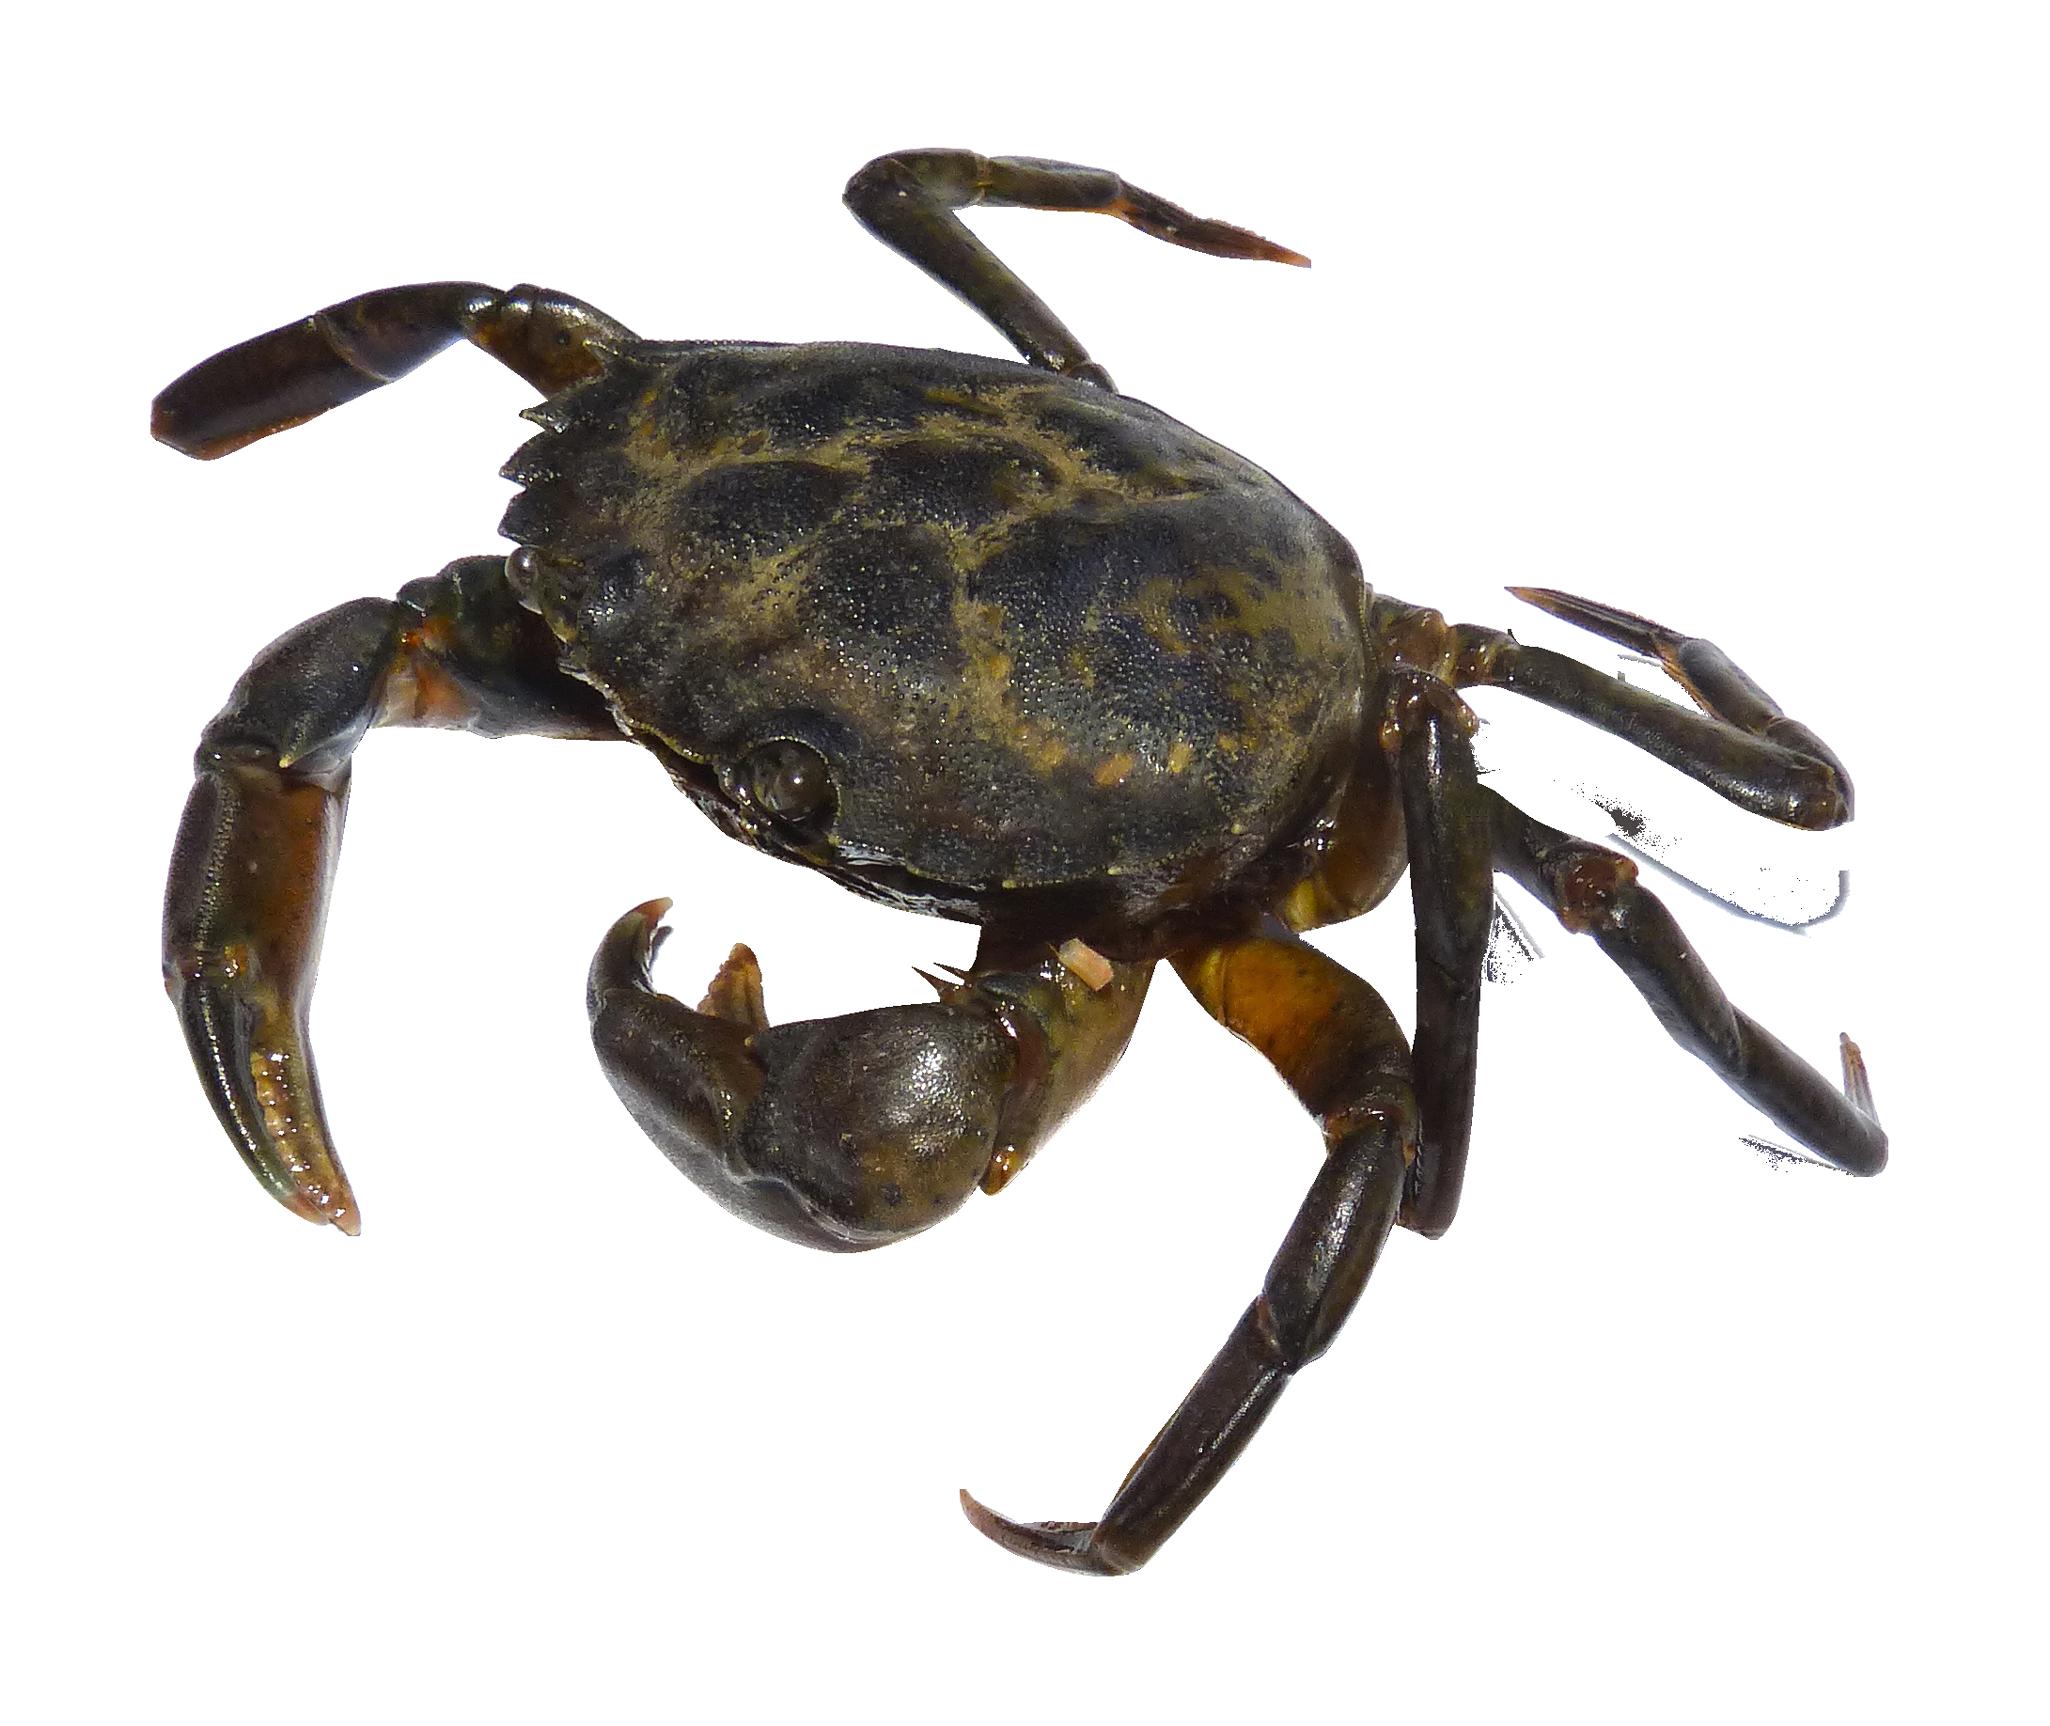 Shell png images pngpix. Crab clipart coconut crab